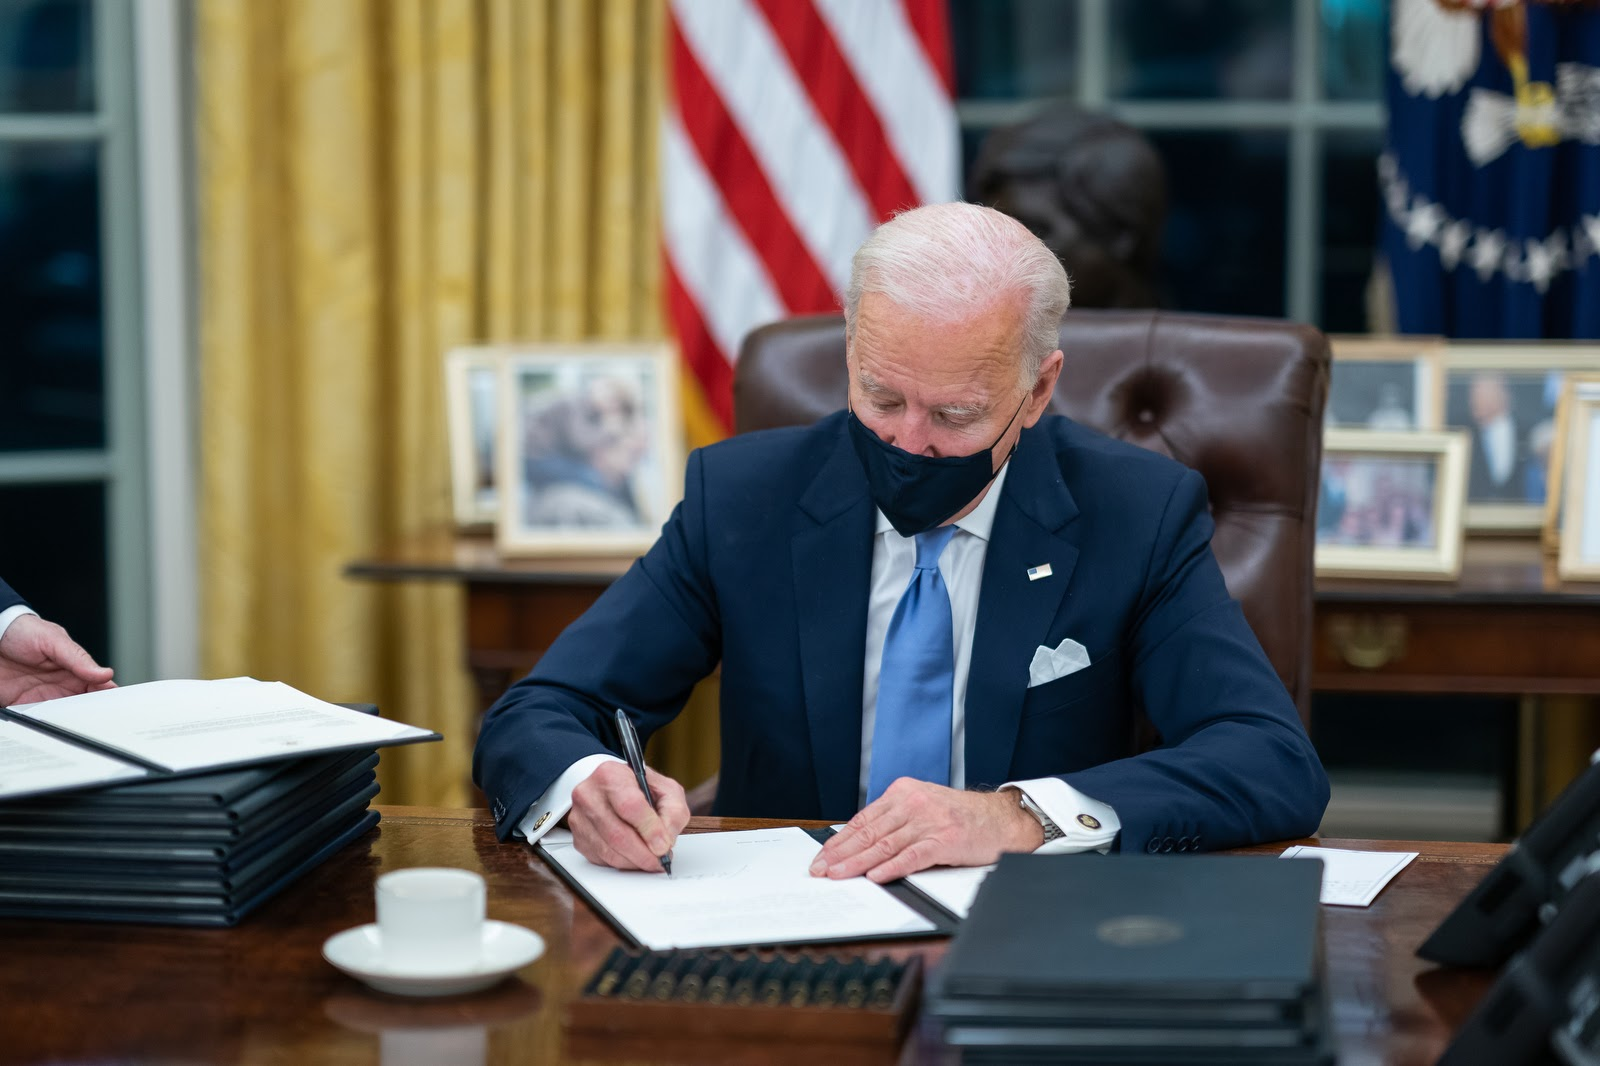 President Joe Biden signs an executive order on Jan 20, 2021.